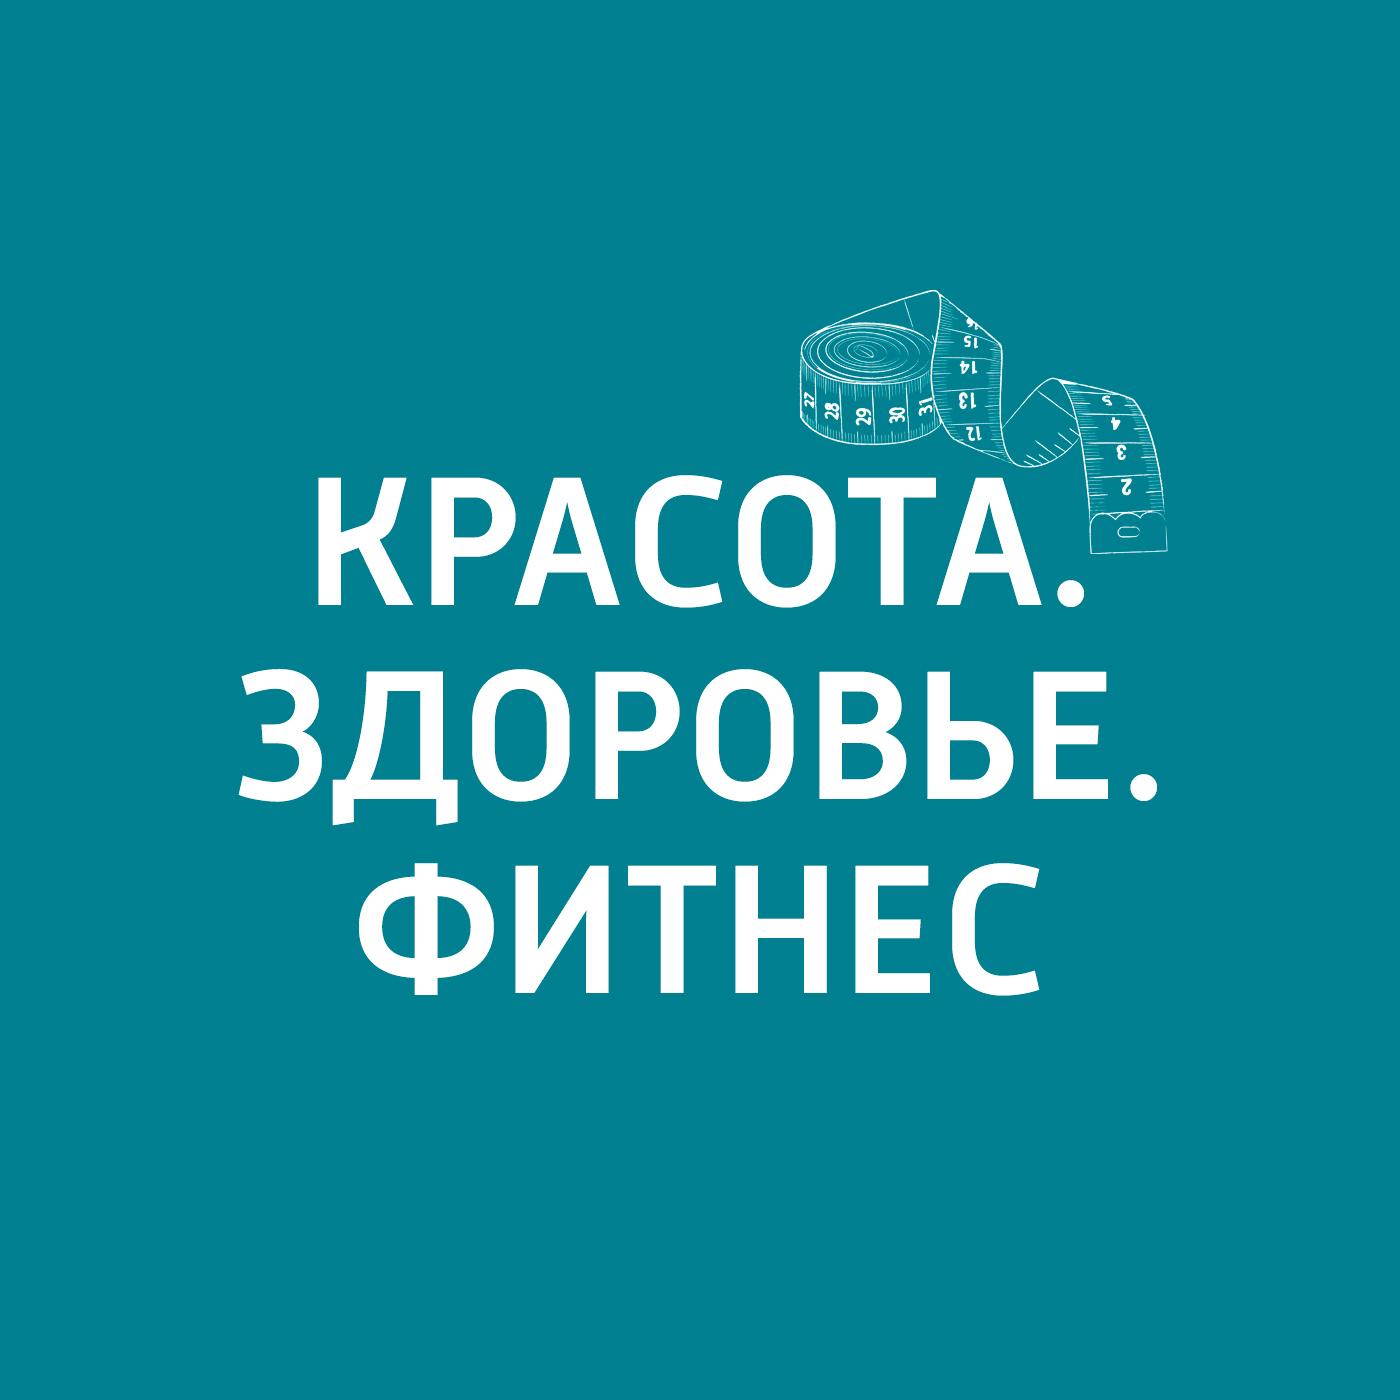 Маргарита Митрофанова Косметические средства и уход за телом в начале XX века